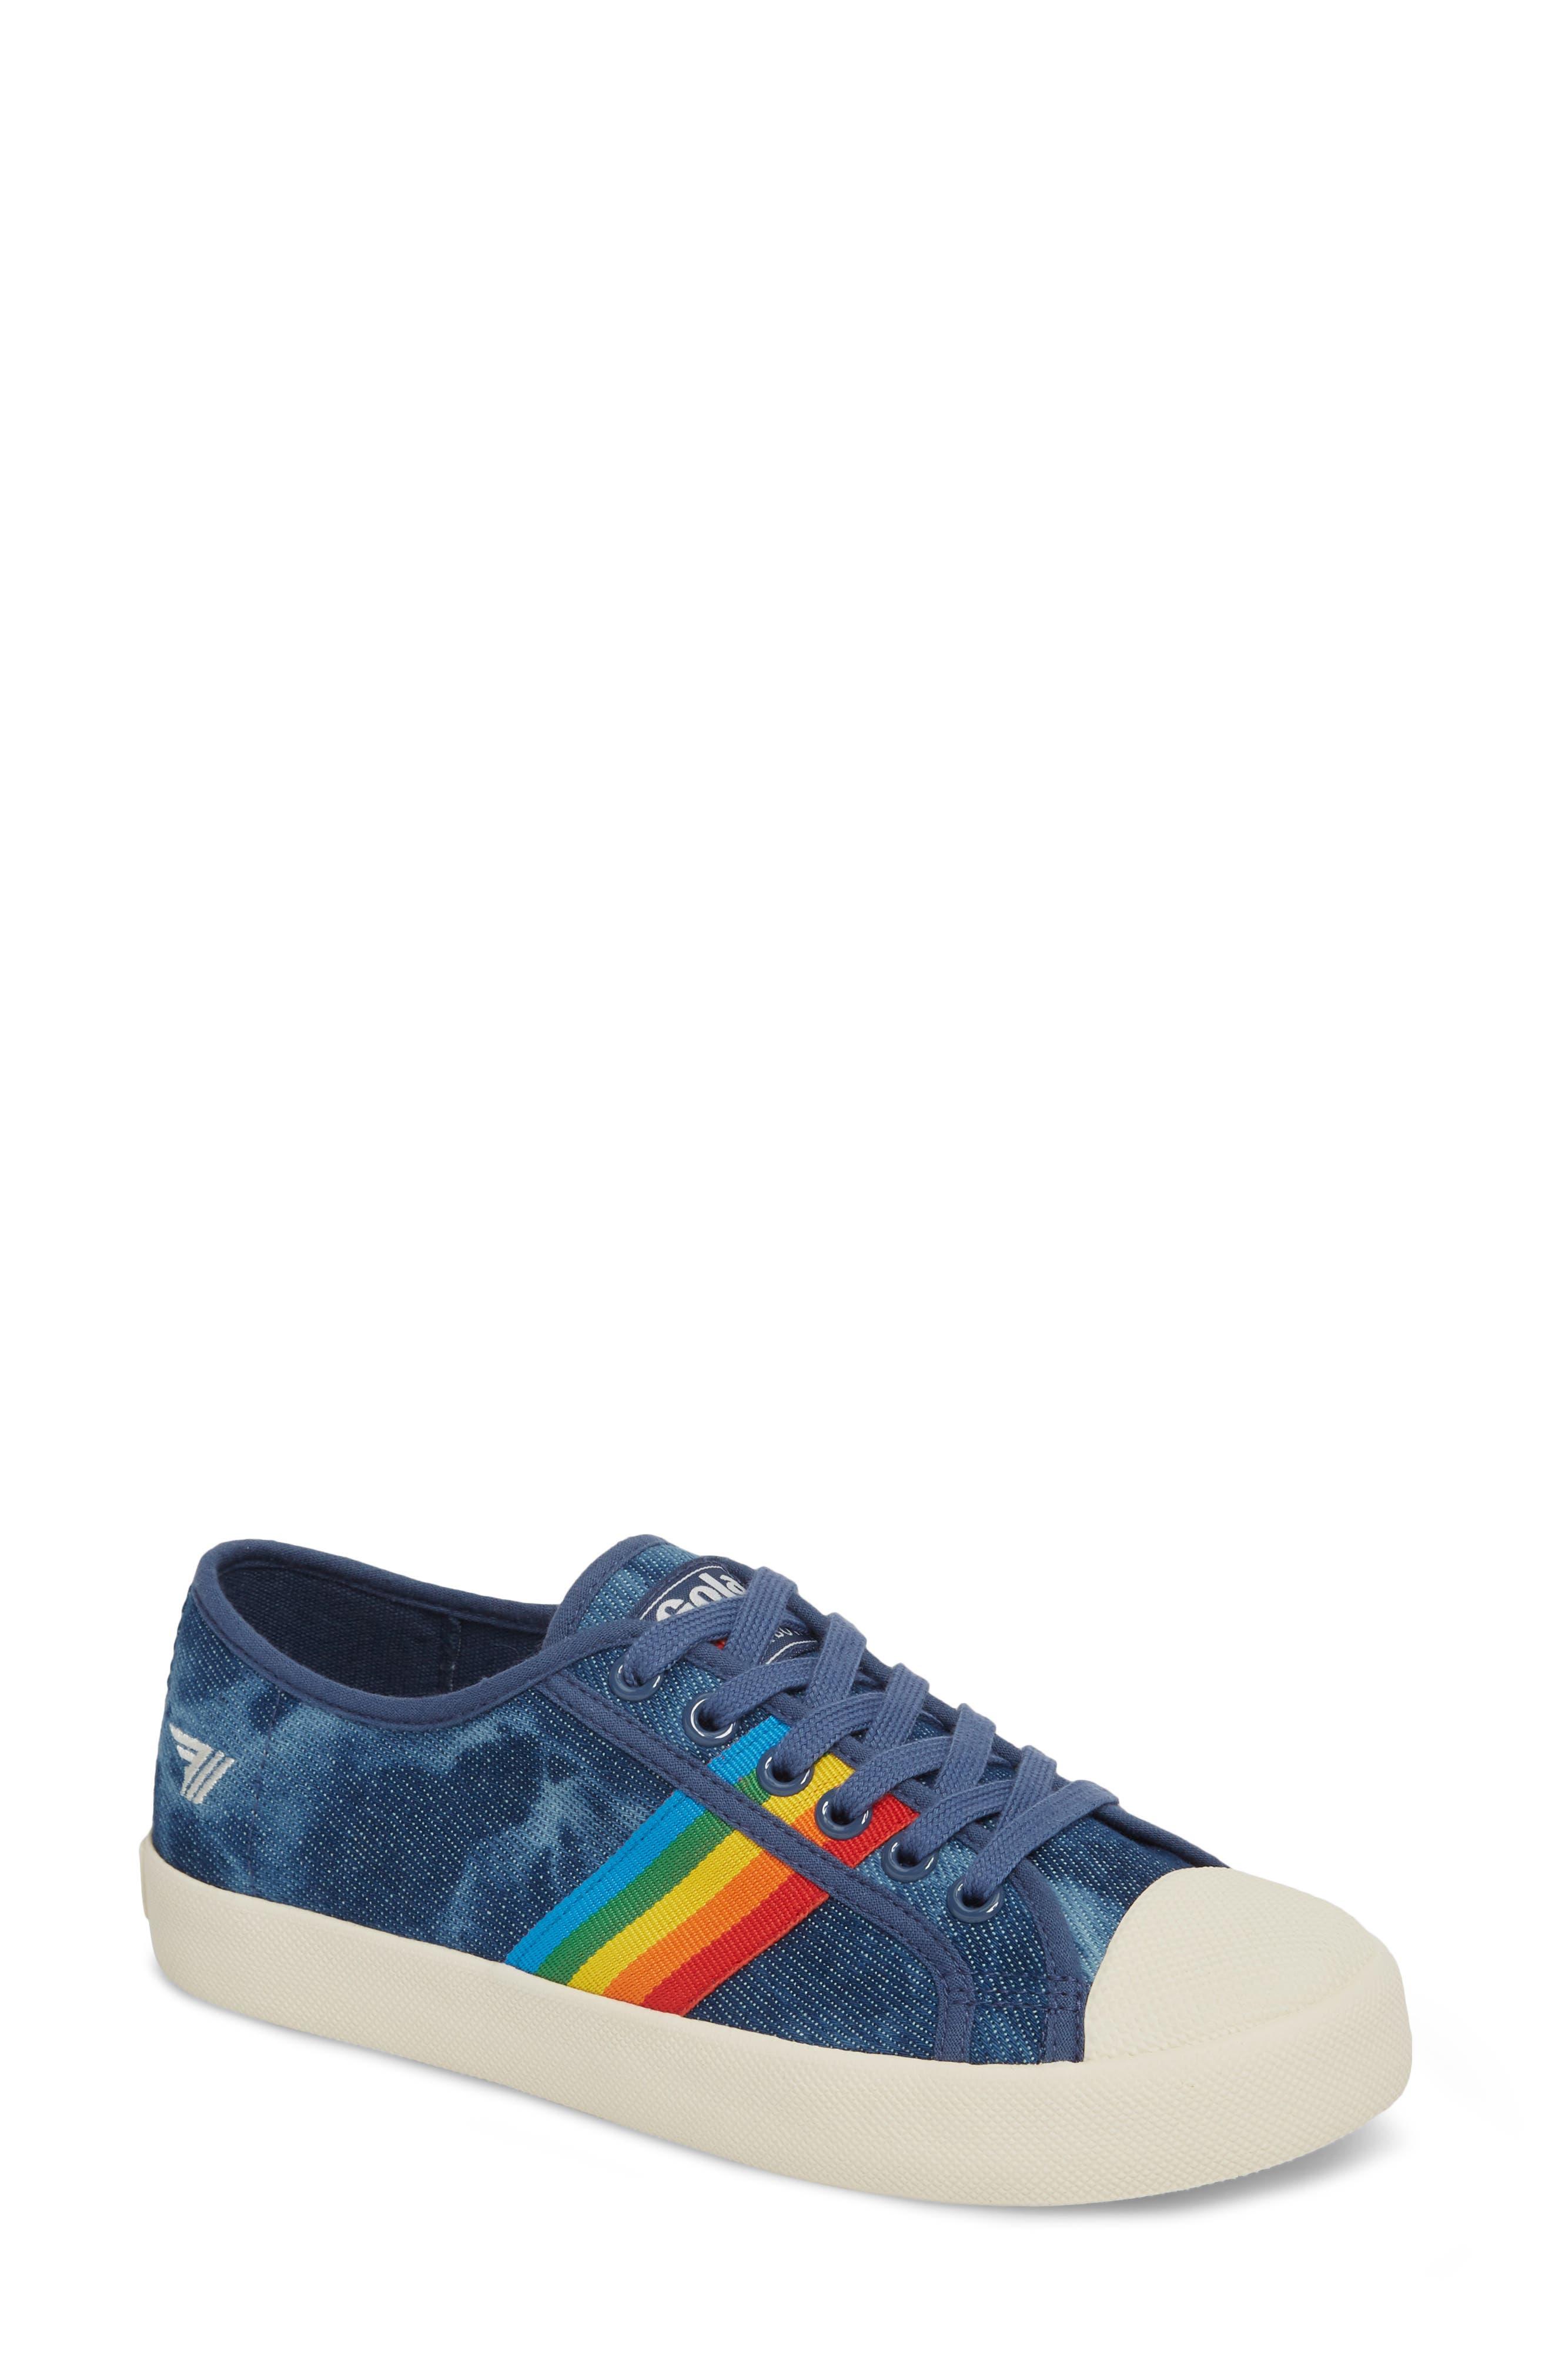 Alternate Image 1 Selected - Gola Coaster Rainbow Striped Sneaker (Women)